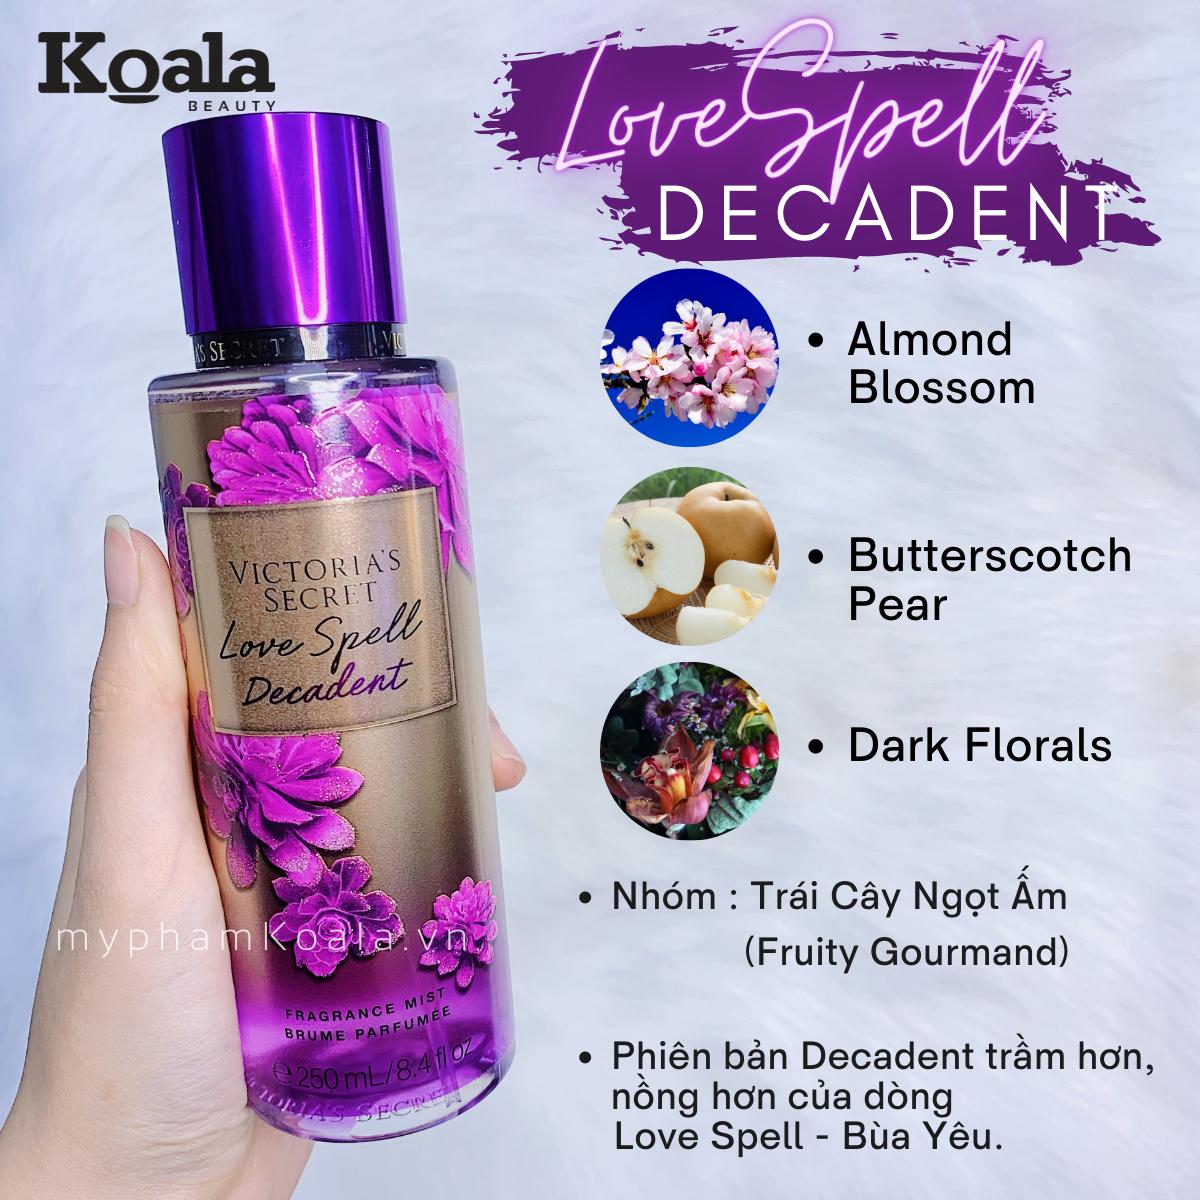 Xịt Body Victoria's Secret LOVE SPELL DECADENT Fragrance Mist